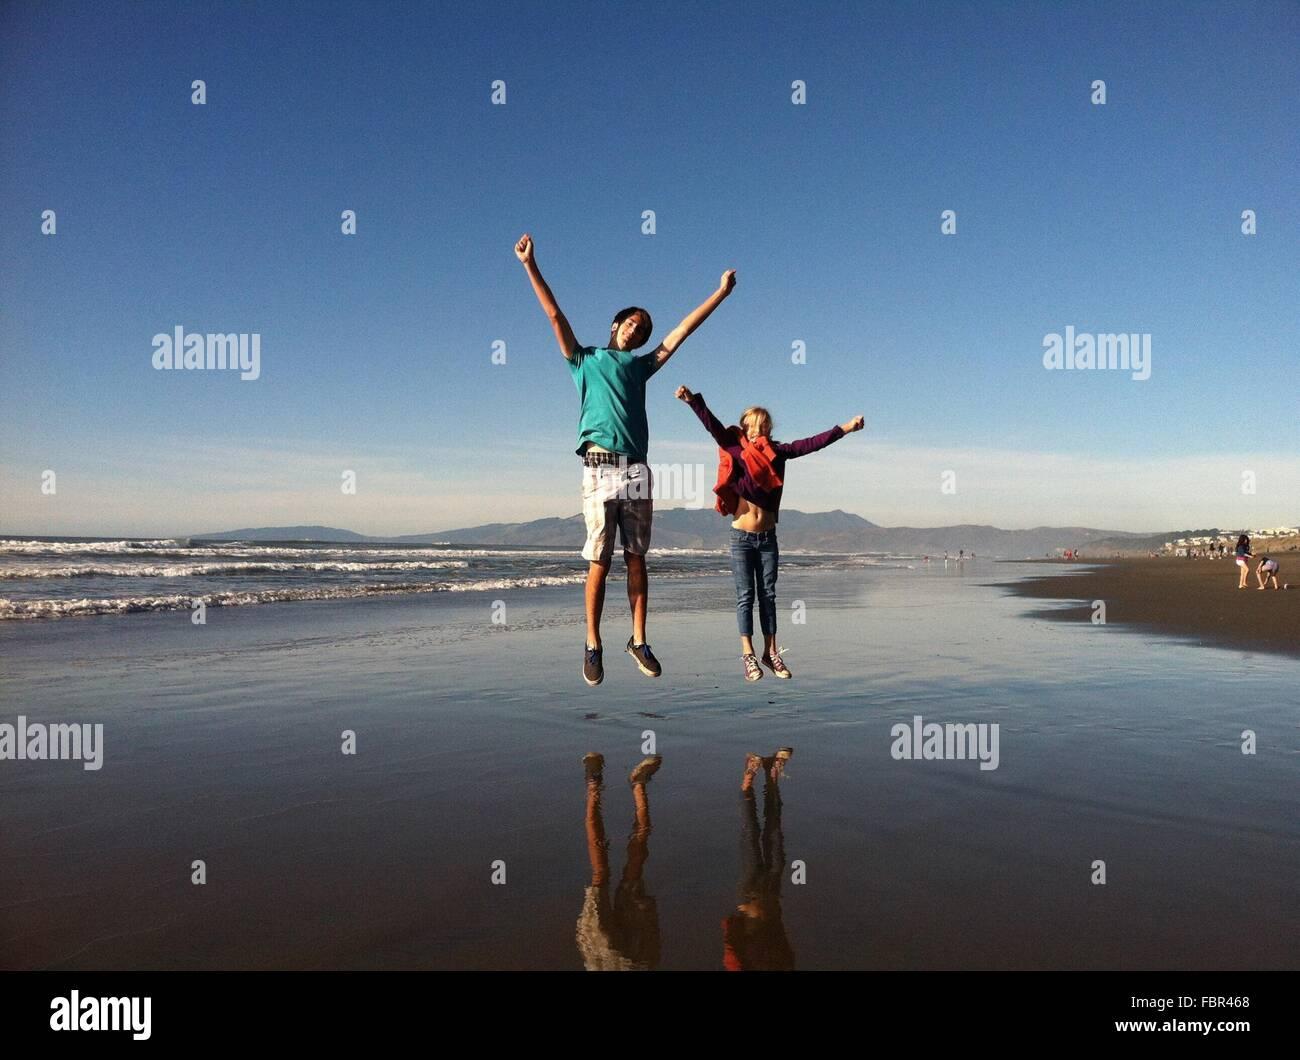 Longitud total de hermano y hermana, saltando en la playa Imagen De Stock